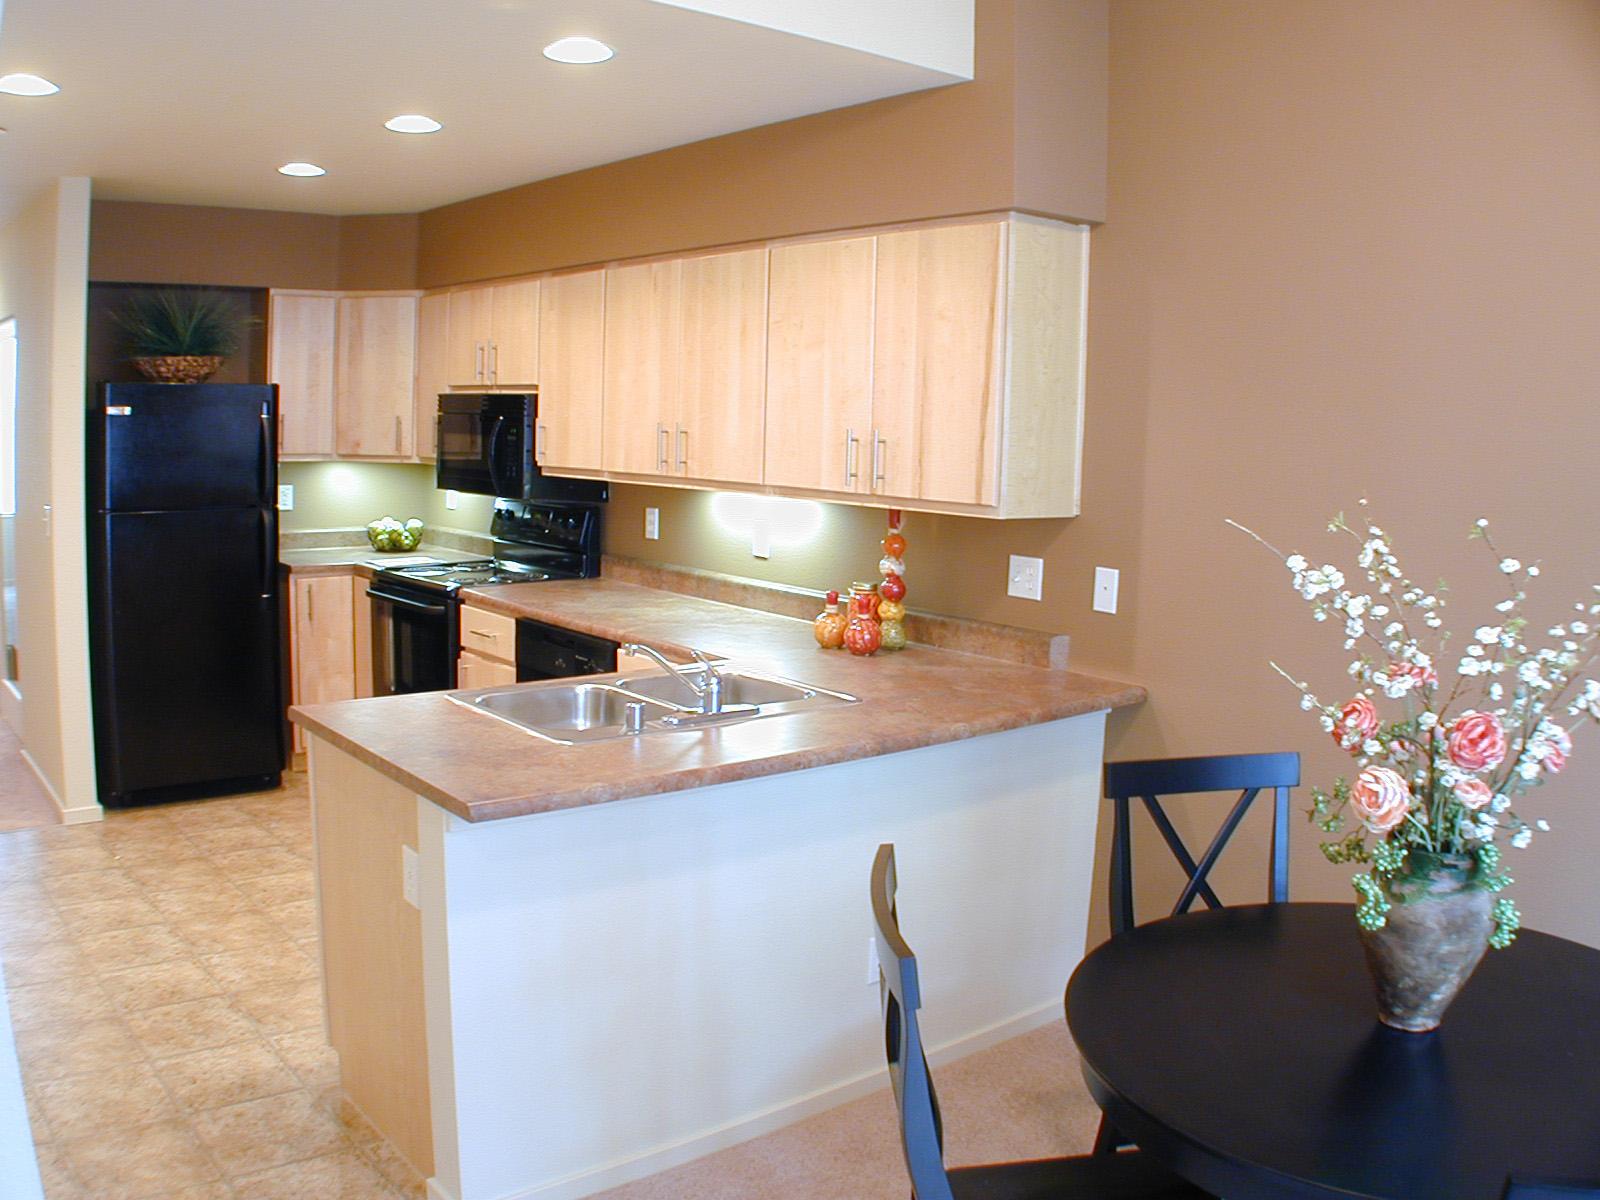 Model_kitchen.jpg